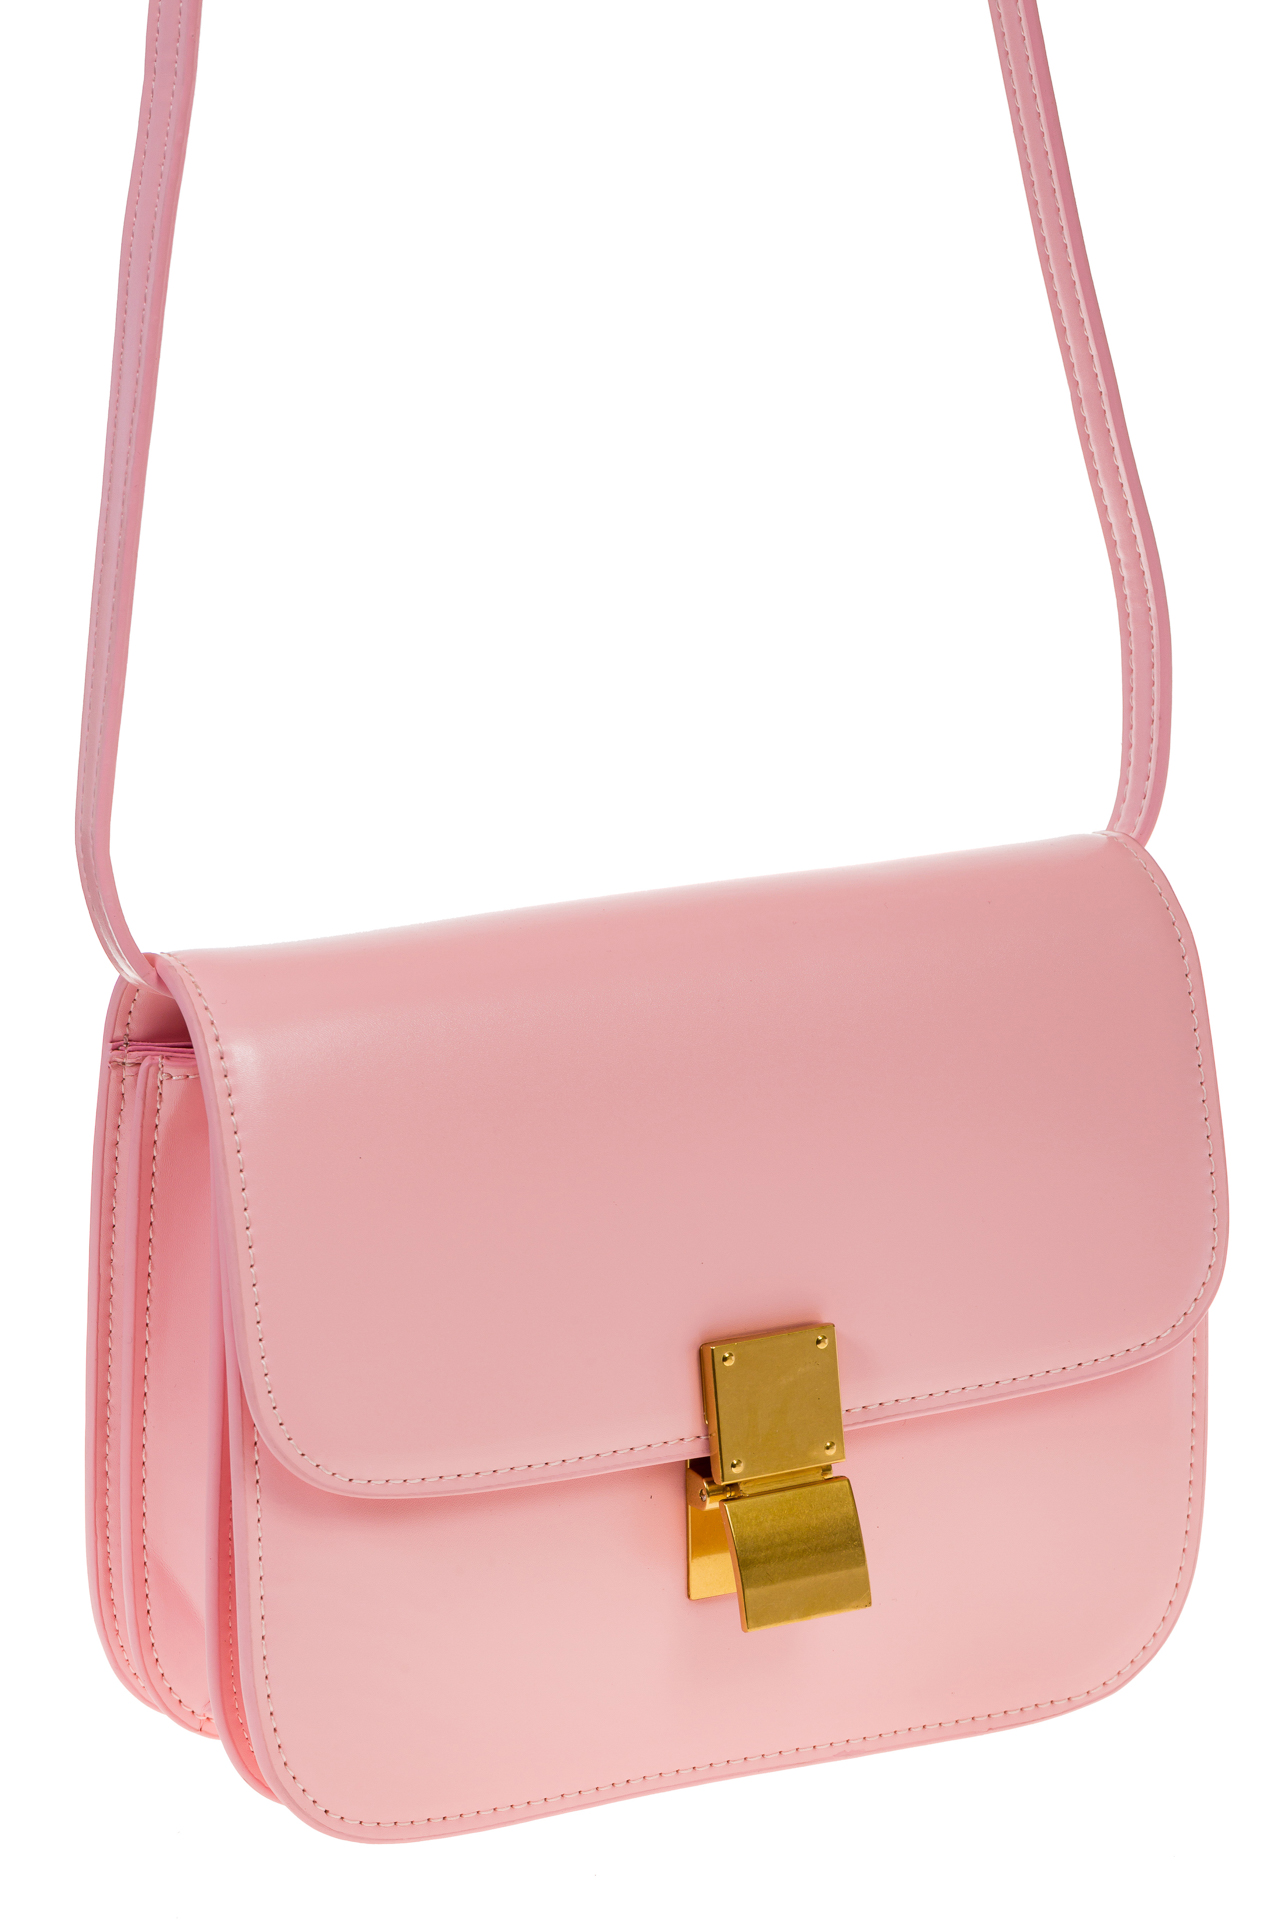 Розовая сумочка cross-body из натуральной кожи 3221MK53221MK5/16